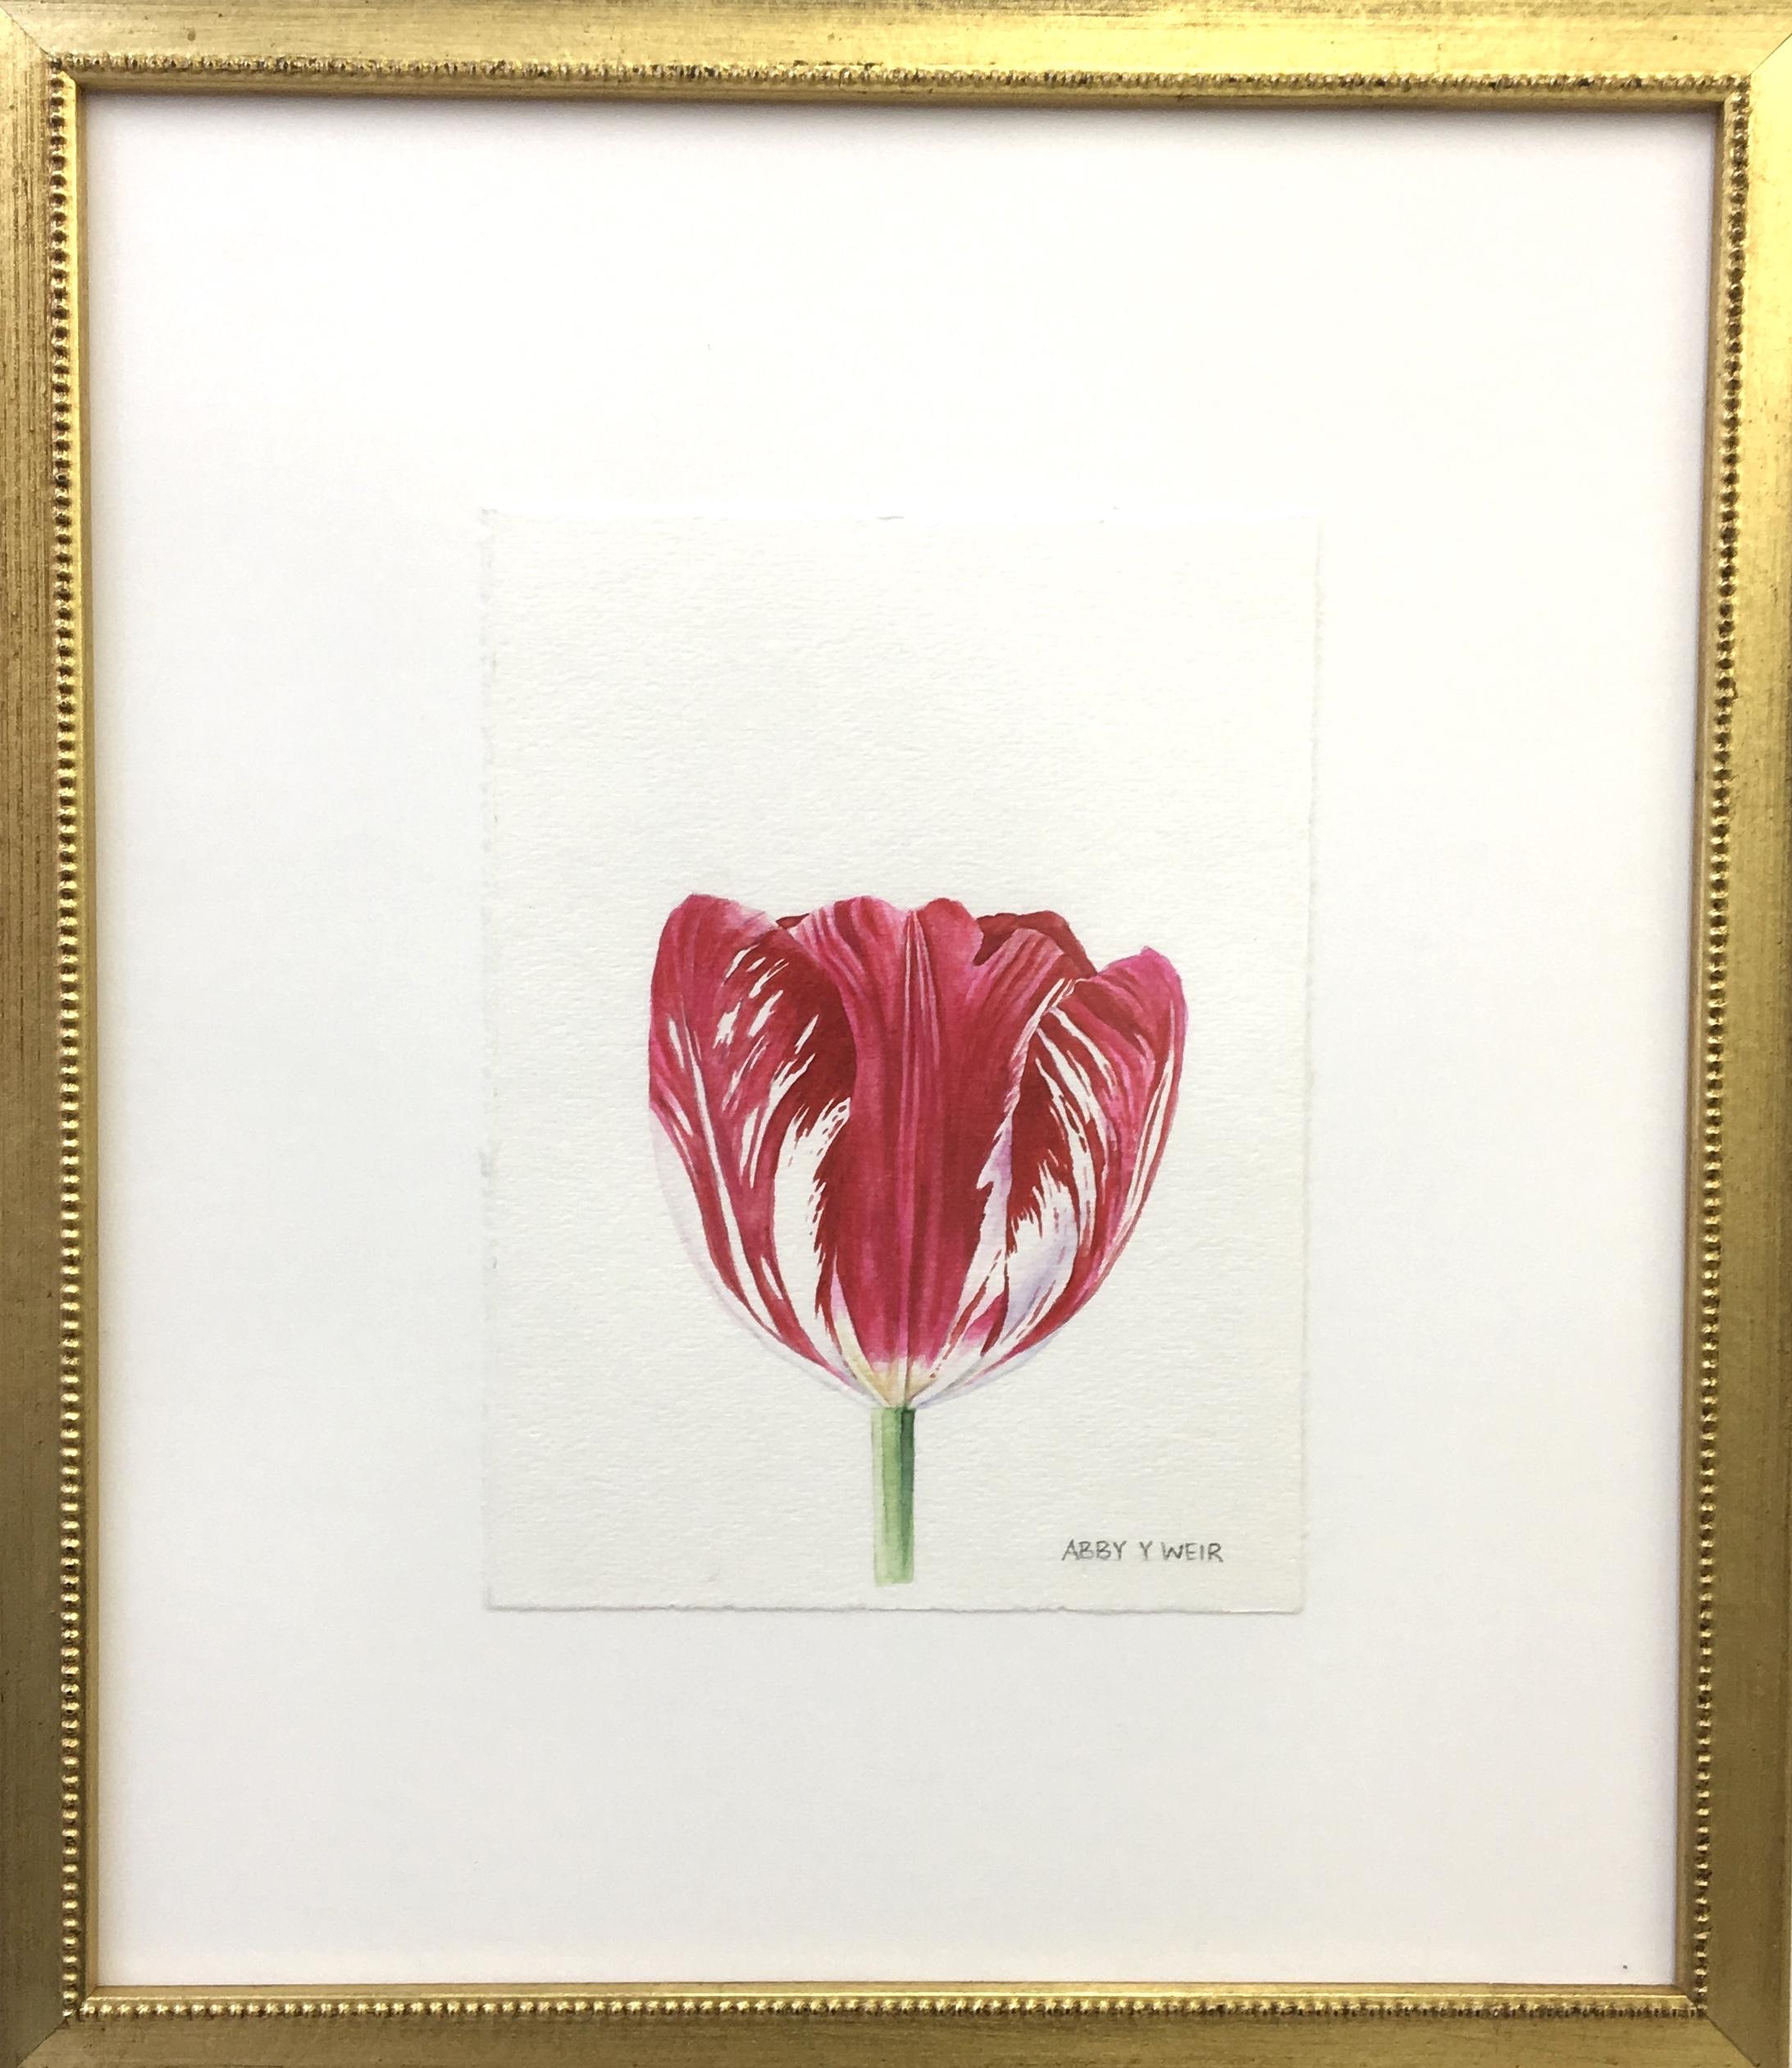 "Tulip 4 Original Watercolor, 2017  6 x 8"", 13 x 15 1/2"" framed"